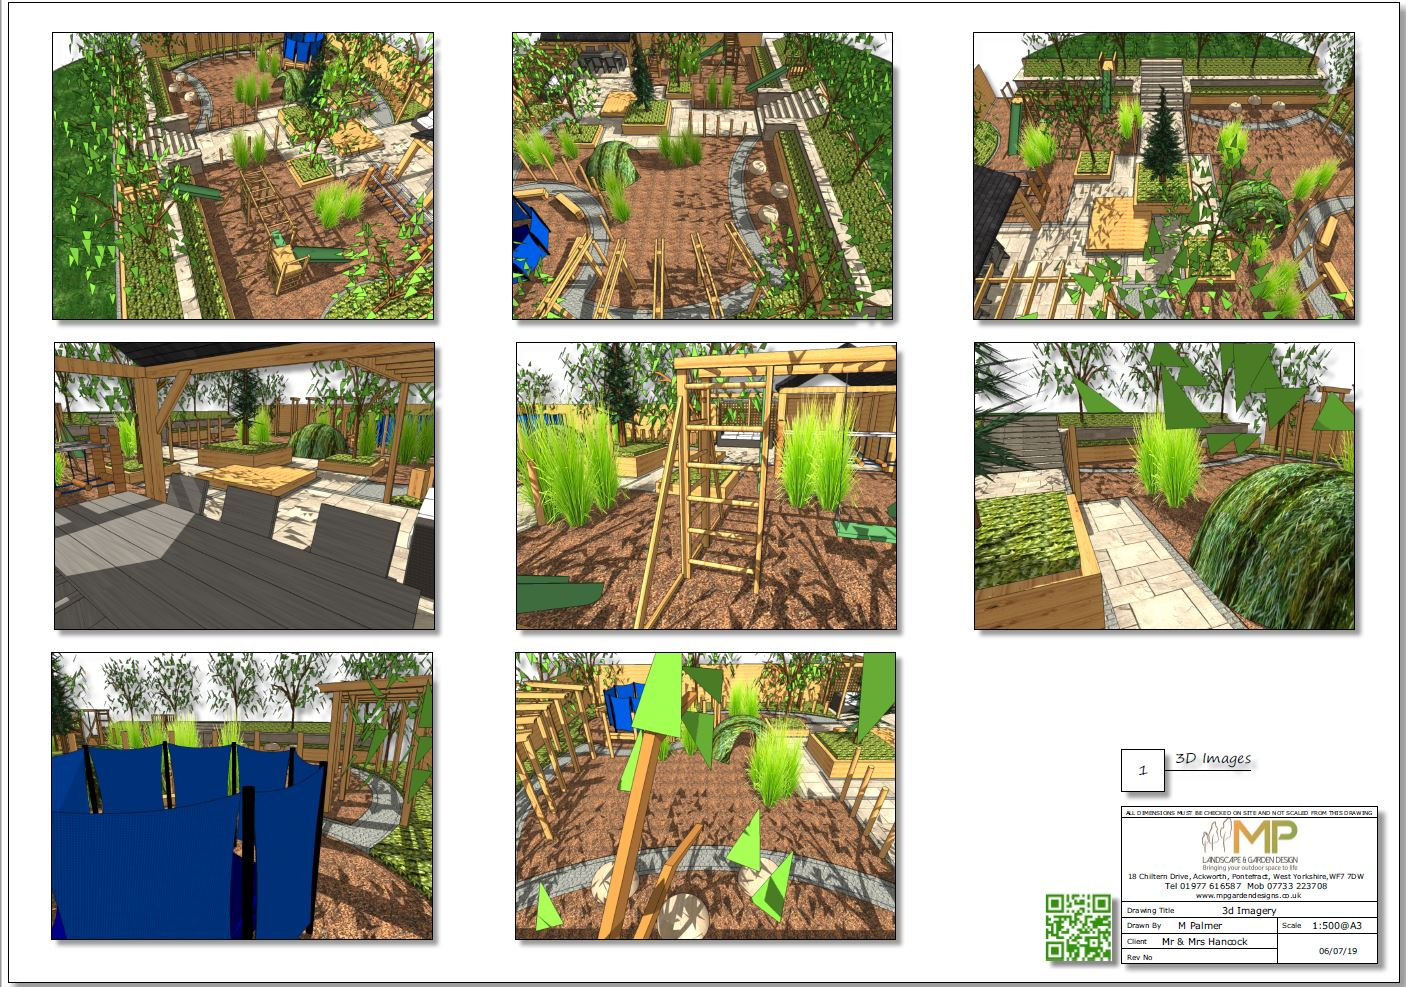 3, Childrens play garden, 3D images, Pontefract